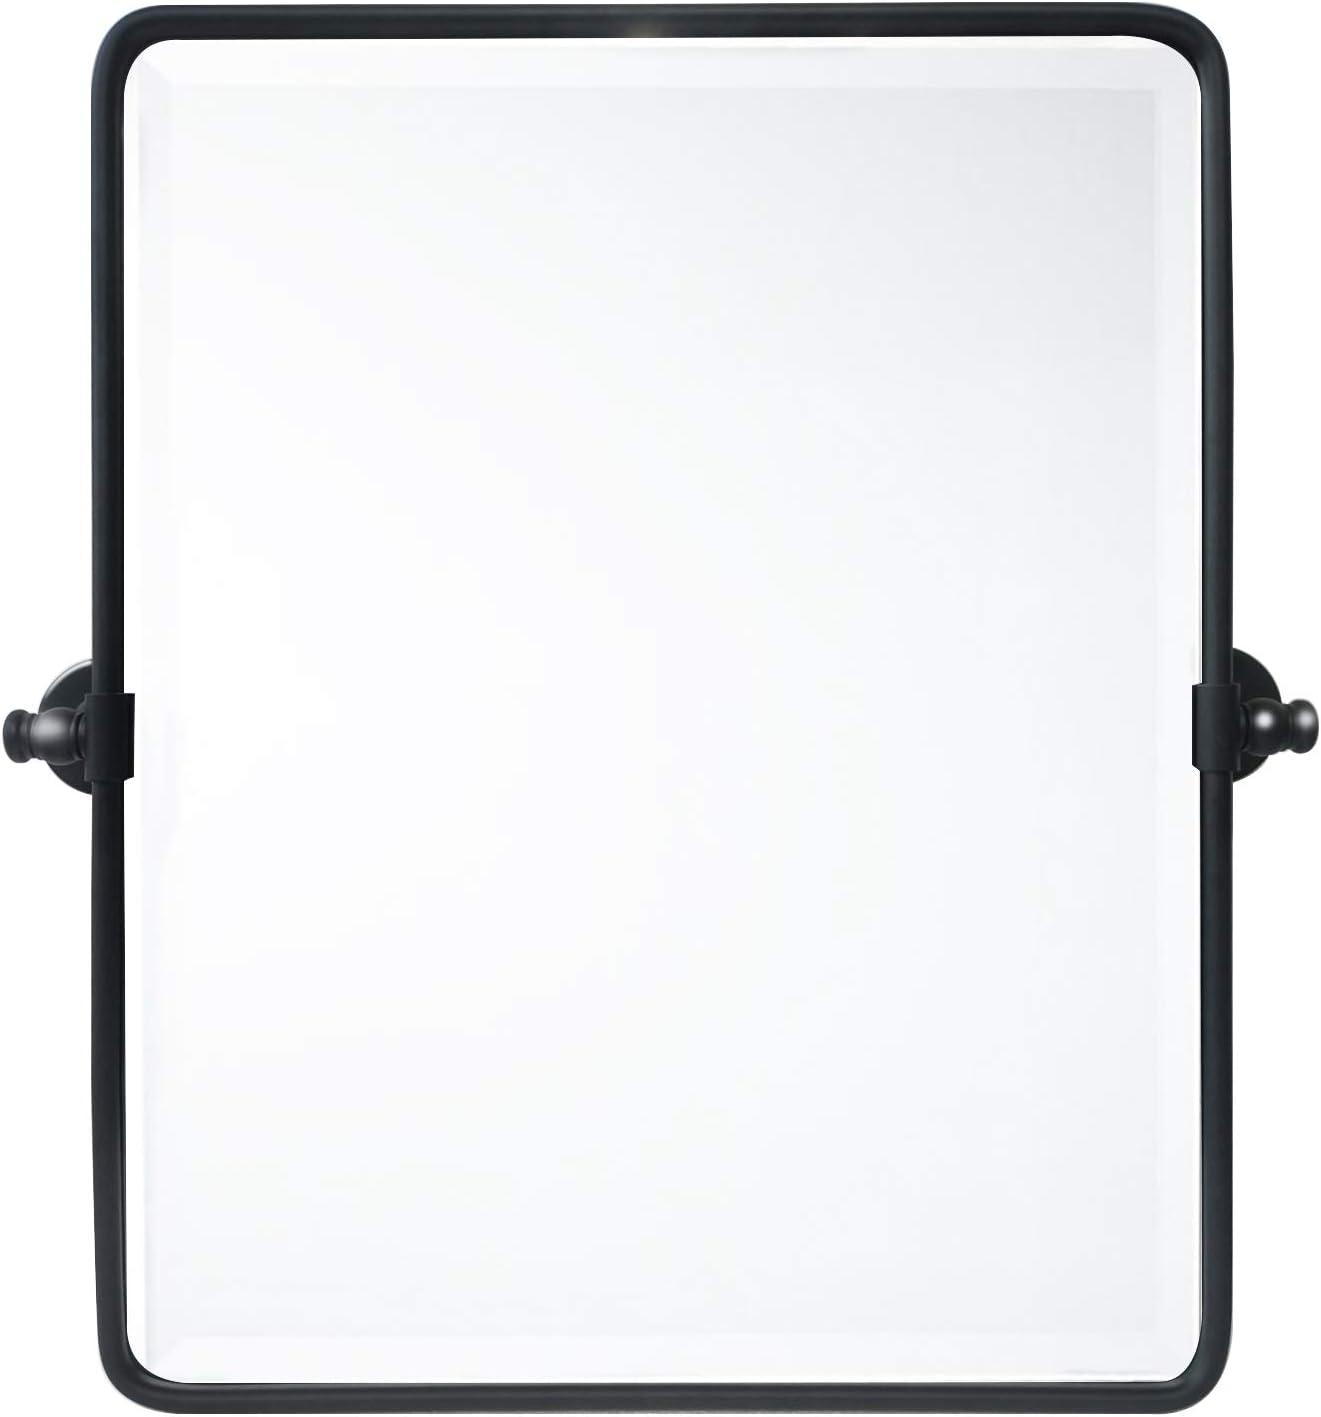 20 x 24 '' Farmhouse Black Metal Framed Pivot Rectangle Bathroom Mirror Rounded Rectangluar Tilting Beveled Vanity Mirrors for Wall Décor